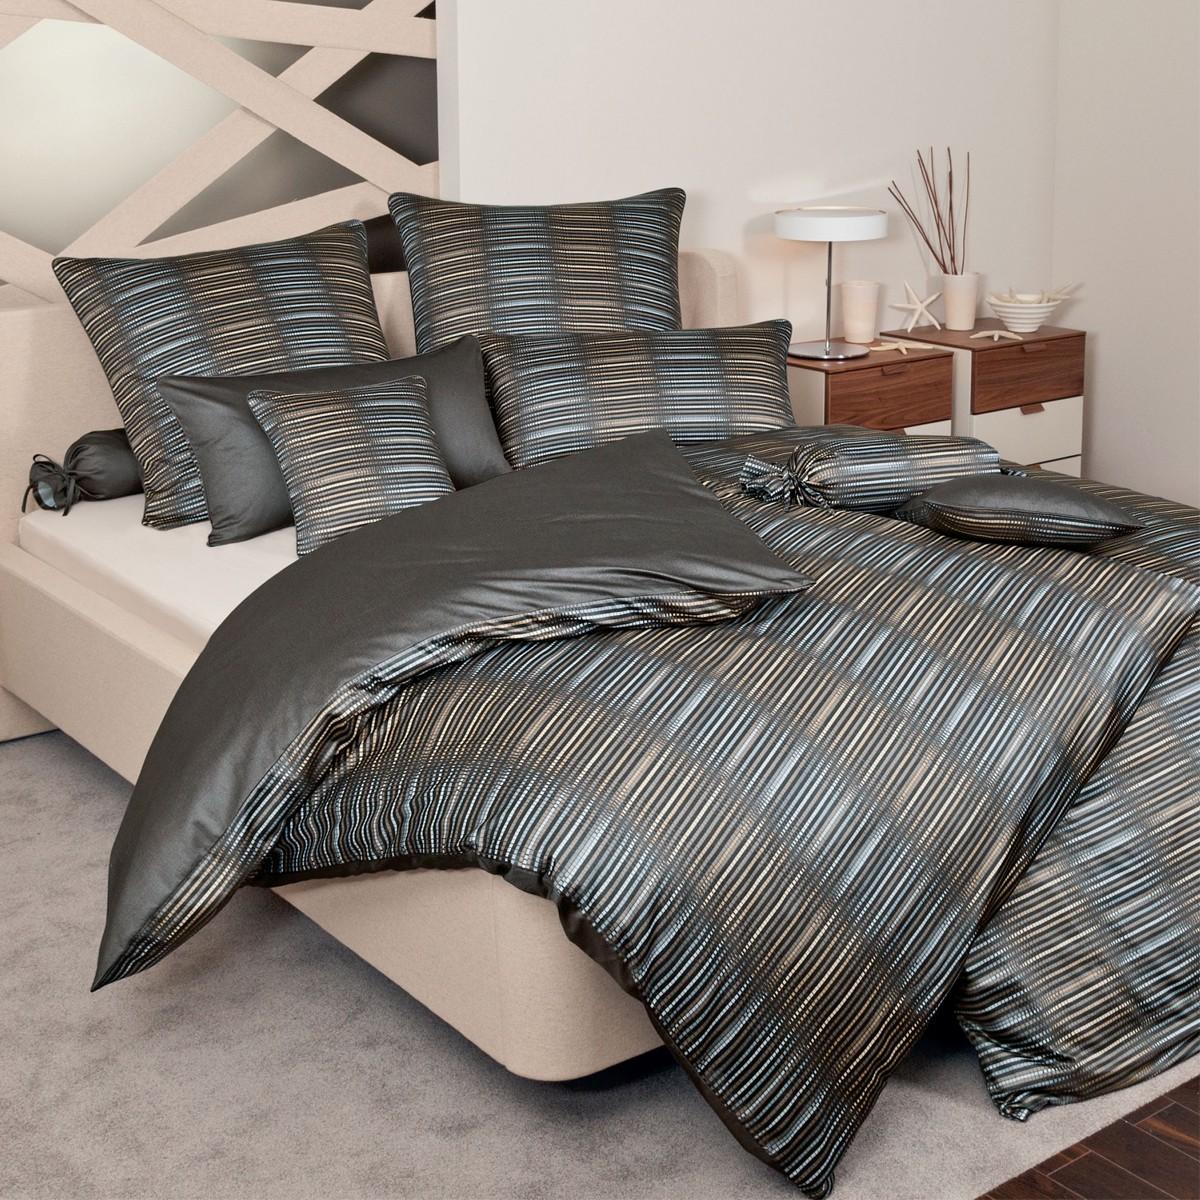 pin braun atelier 1 on pinterest. Black Bedroom Furniture Sets. Home Design Ideas